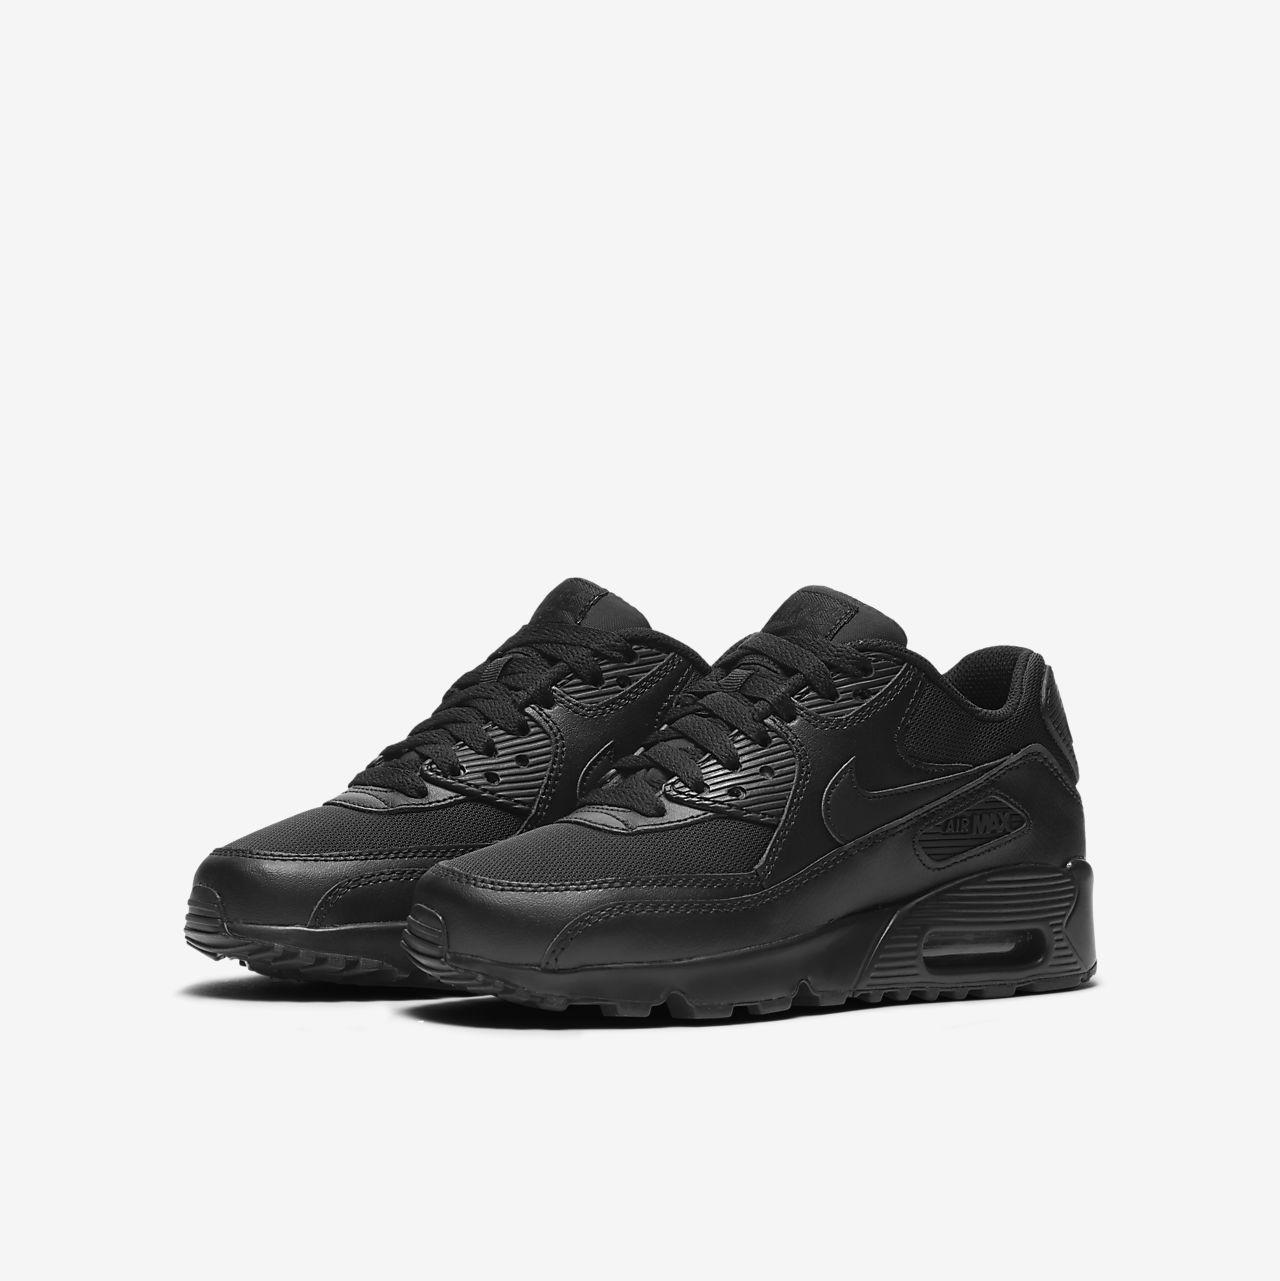 detailed look f5f92 28418 ... Nike Air Max 90 Mesh Older Kids Shoe